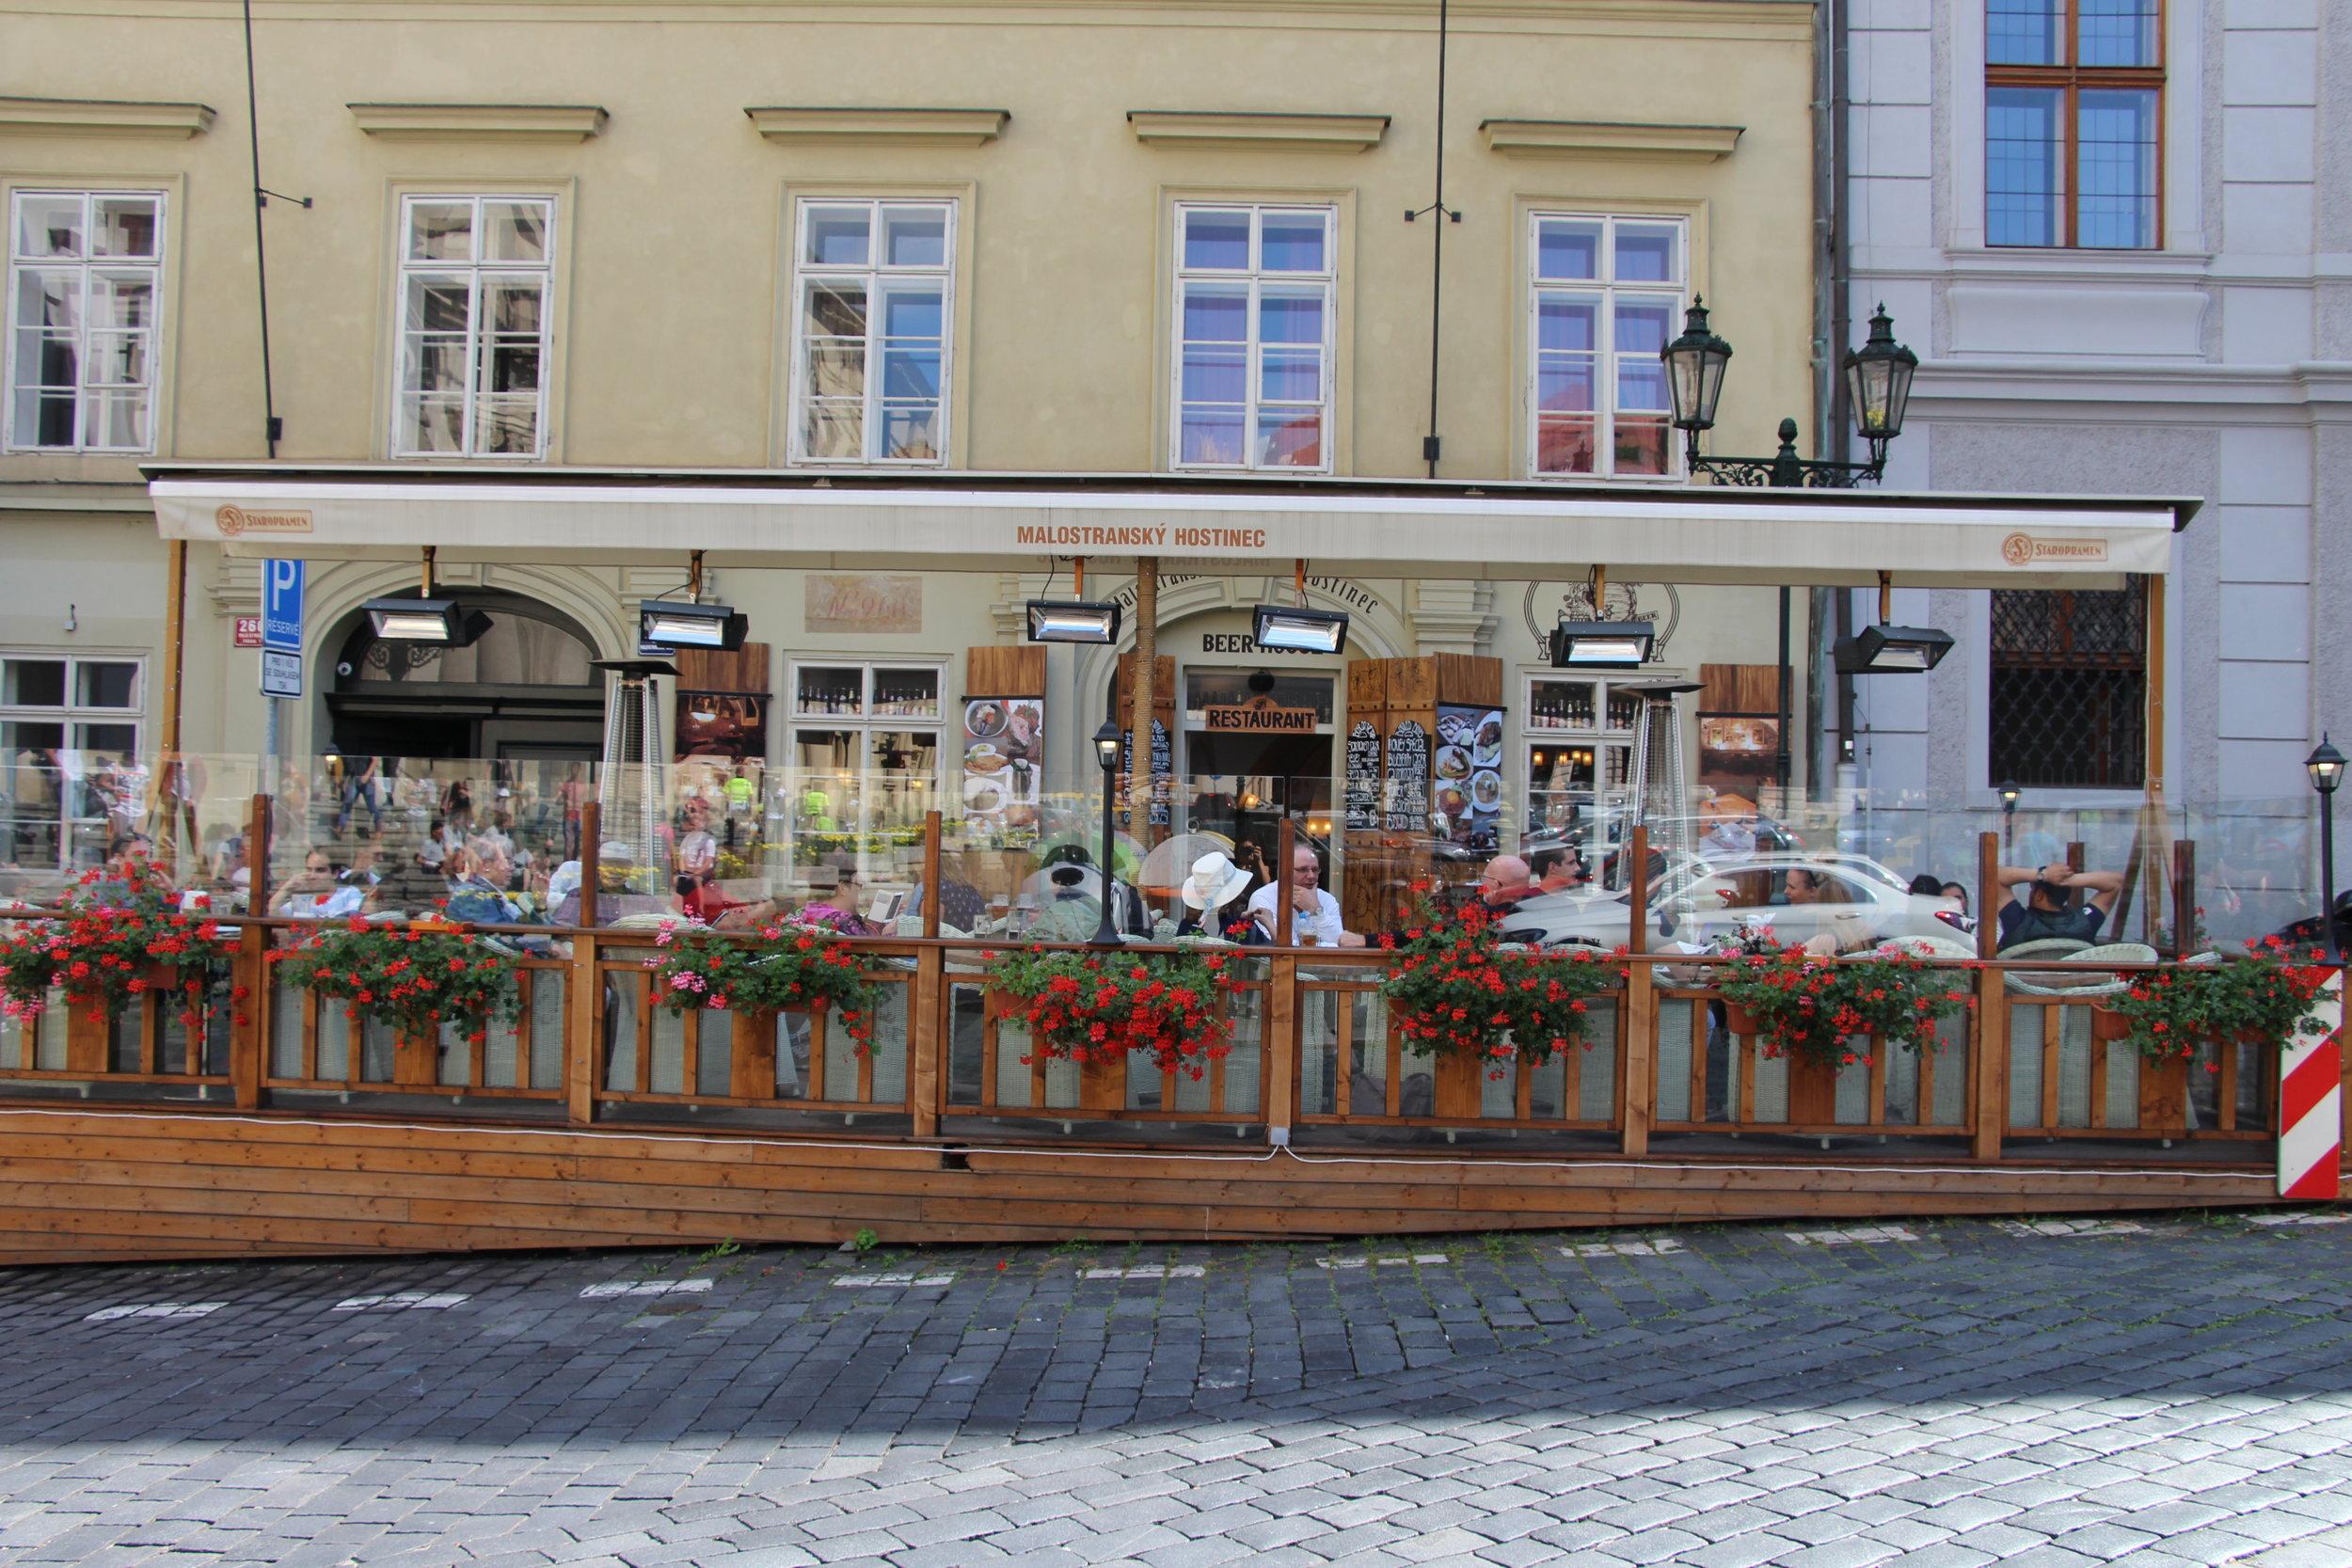 Malostransky Hostinec Prague, Places to eat in Prague